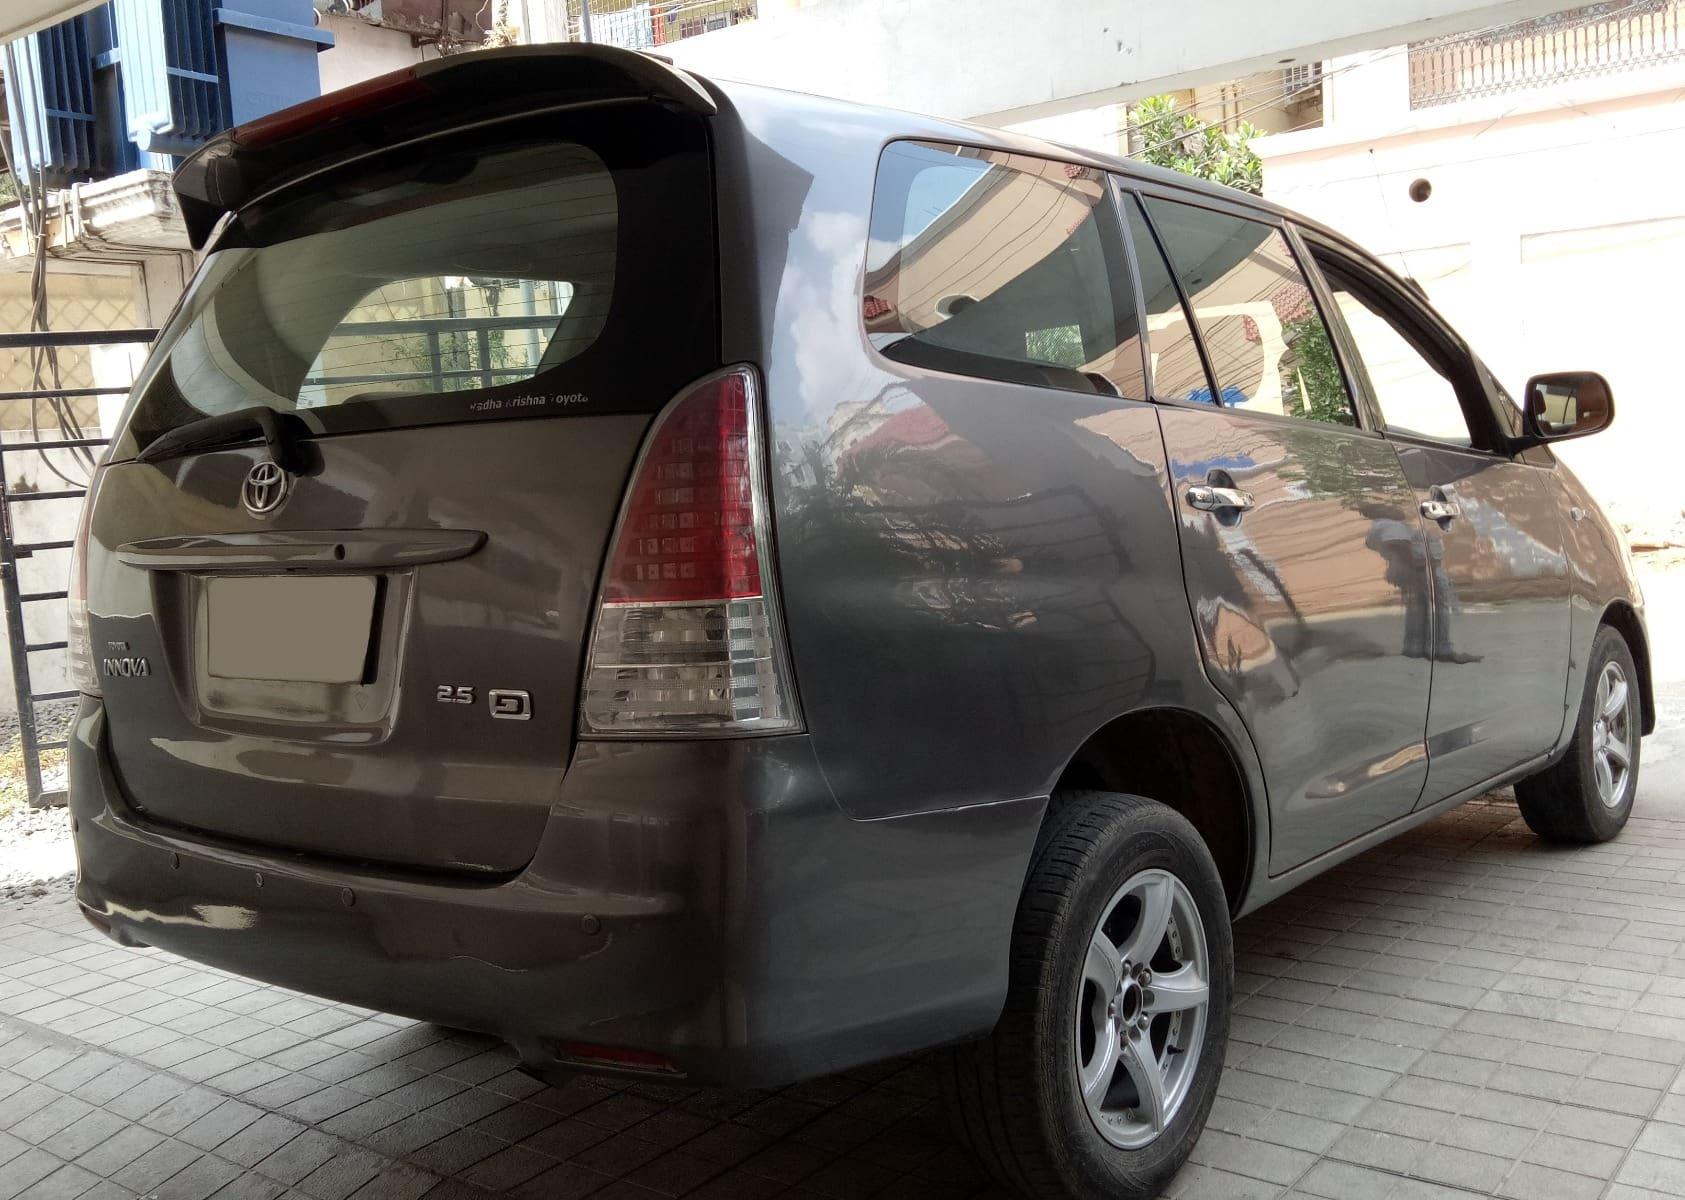 Toyota Innova 2004-2011 2.5 G (Diesel) 8 Seater BS IV